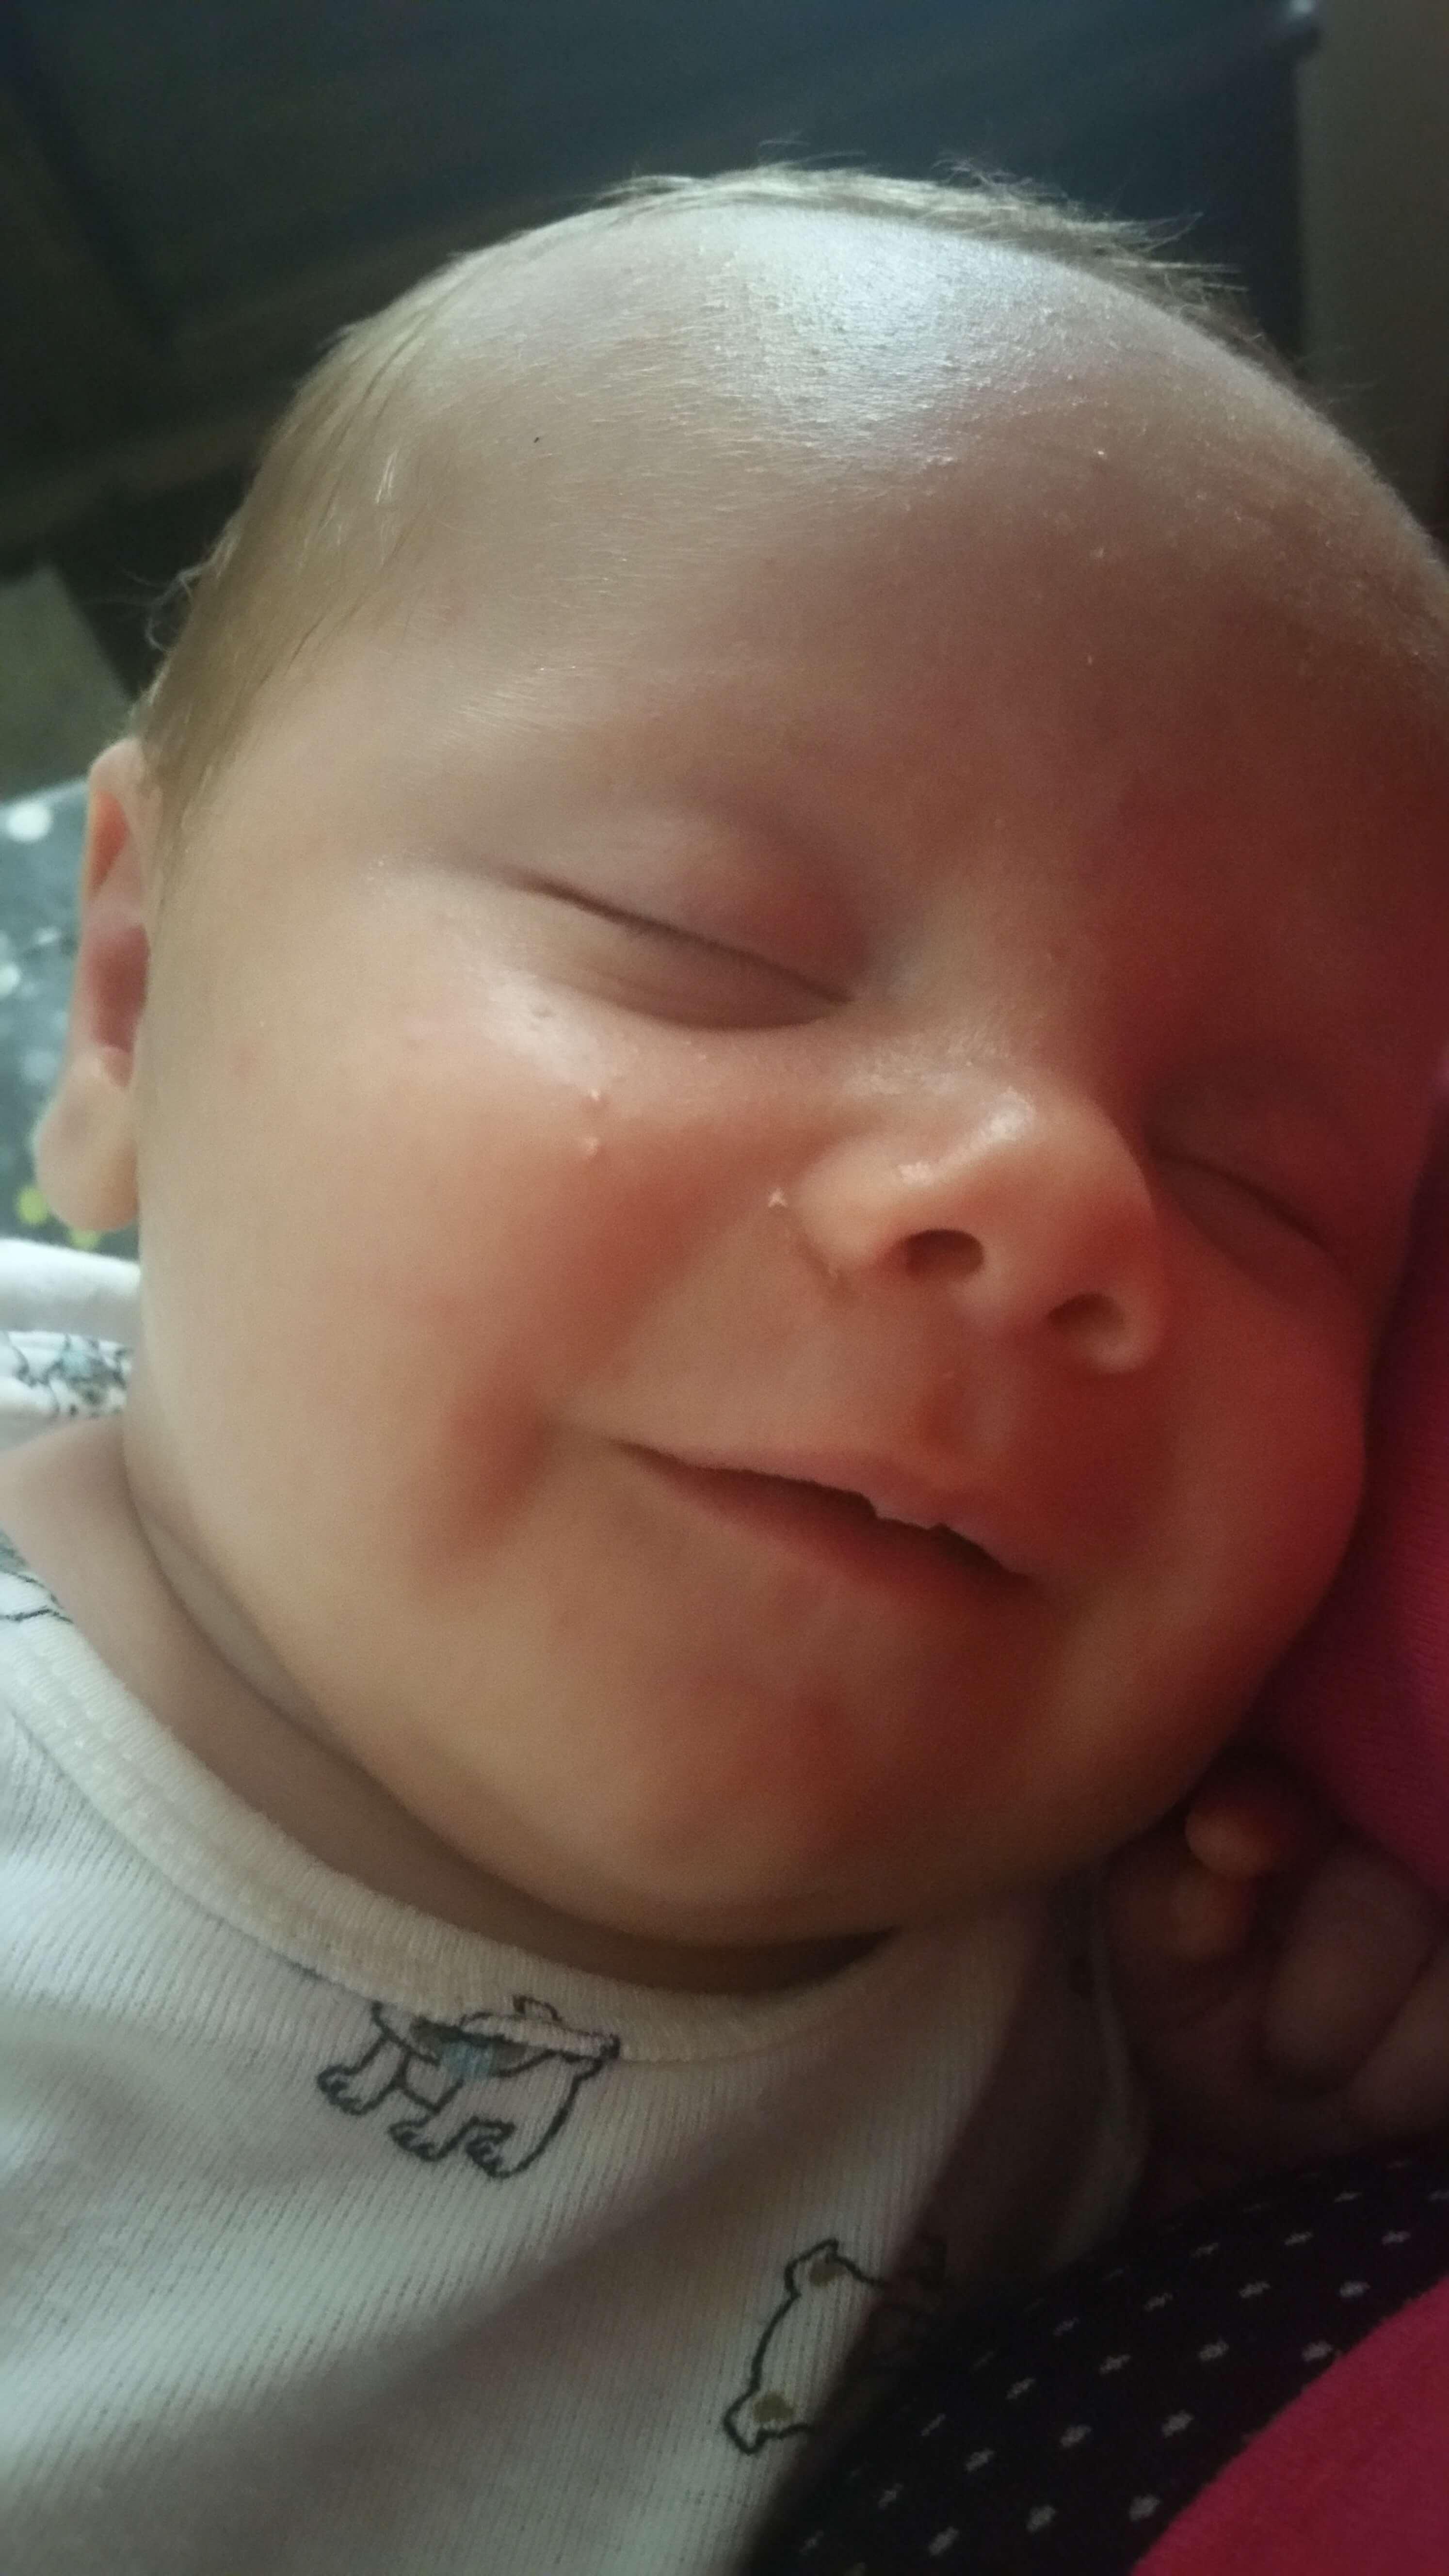 hypnobirthing helped sara during her hospital birth